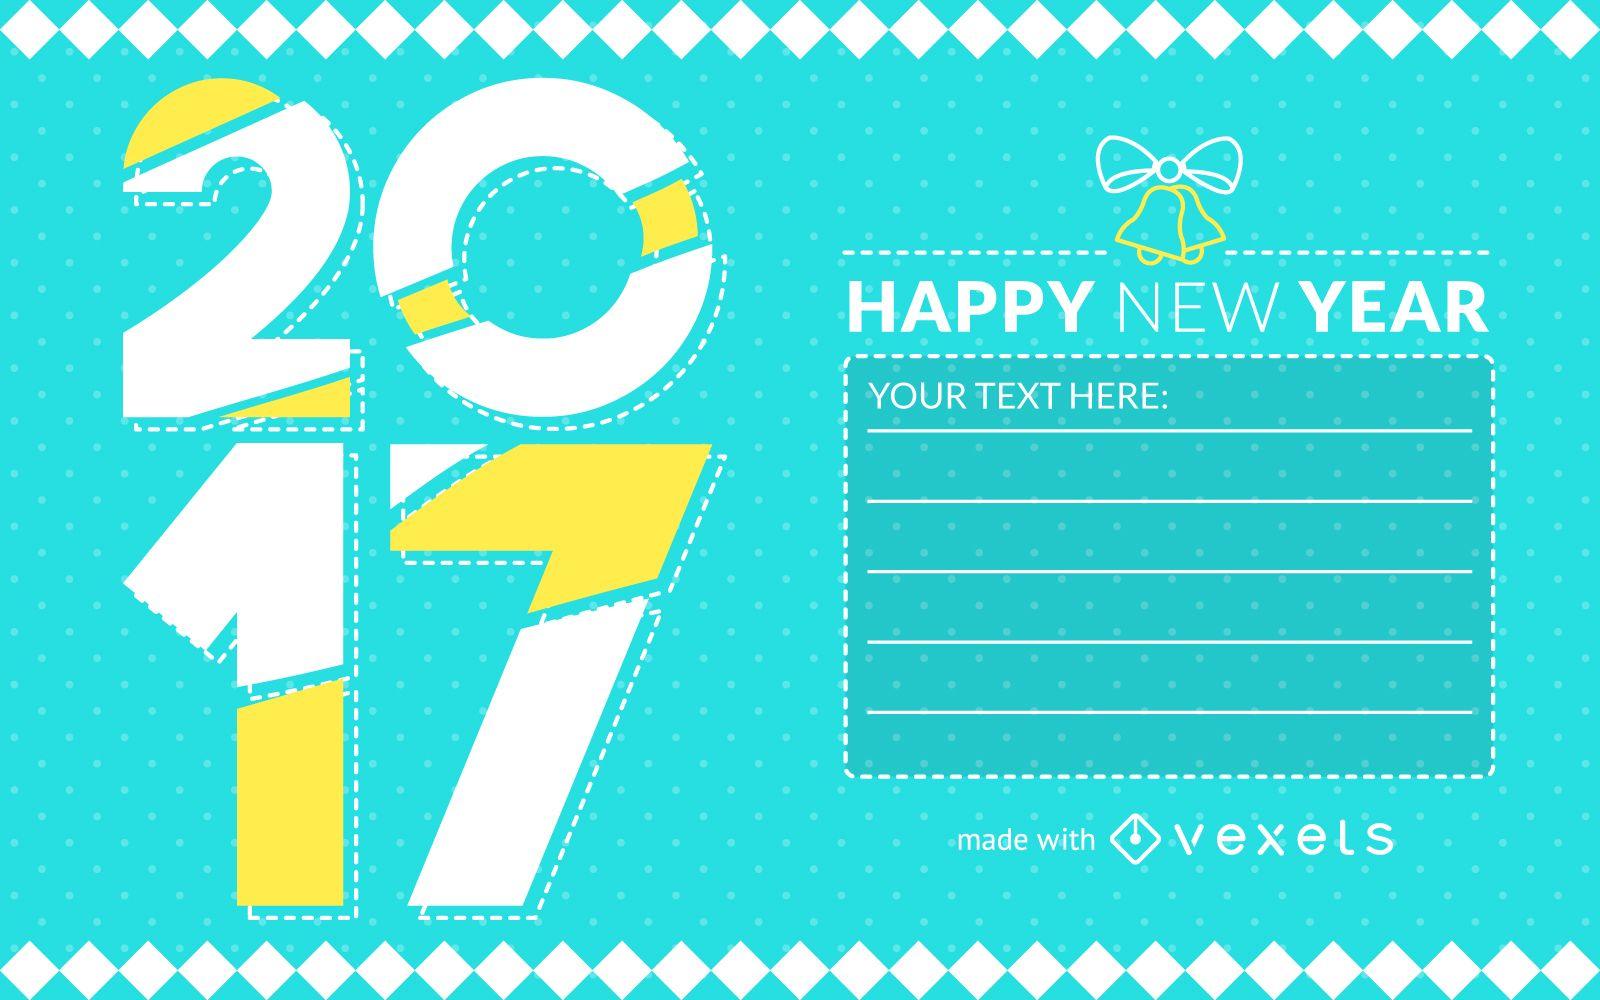 2017 New Year card maker